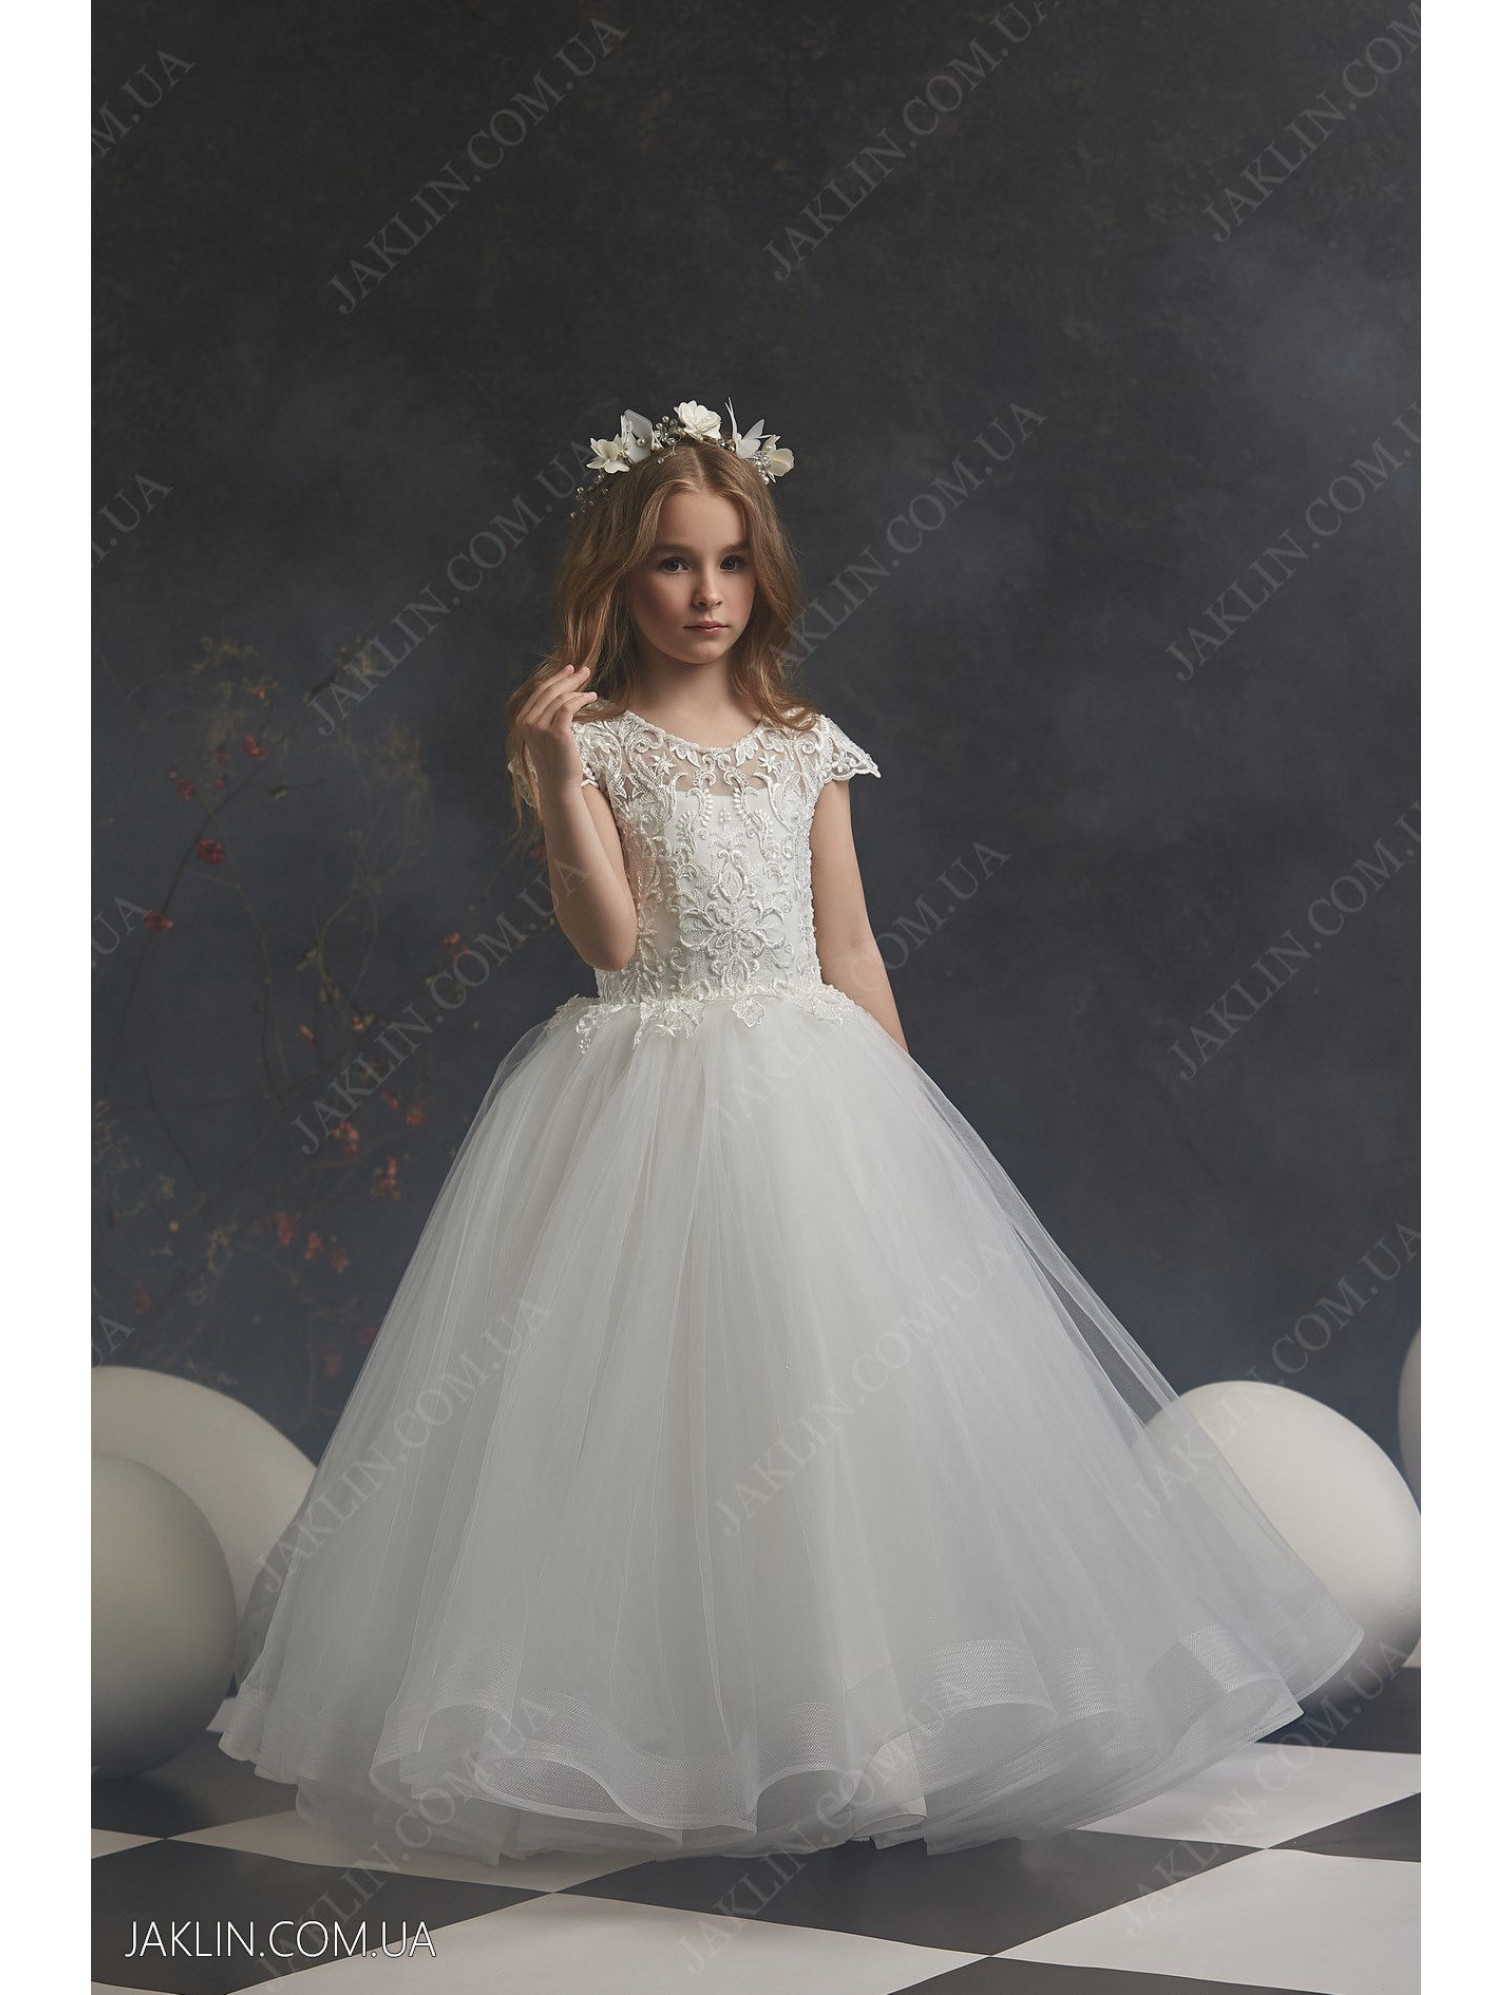 Child dress 3033